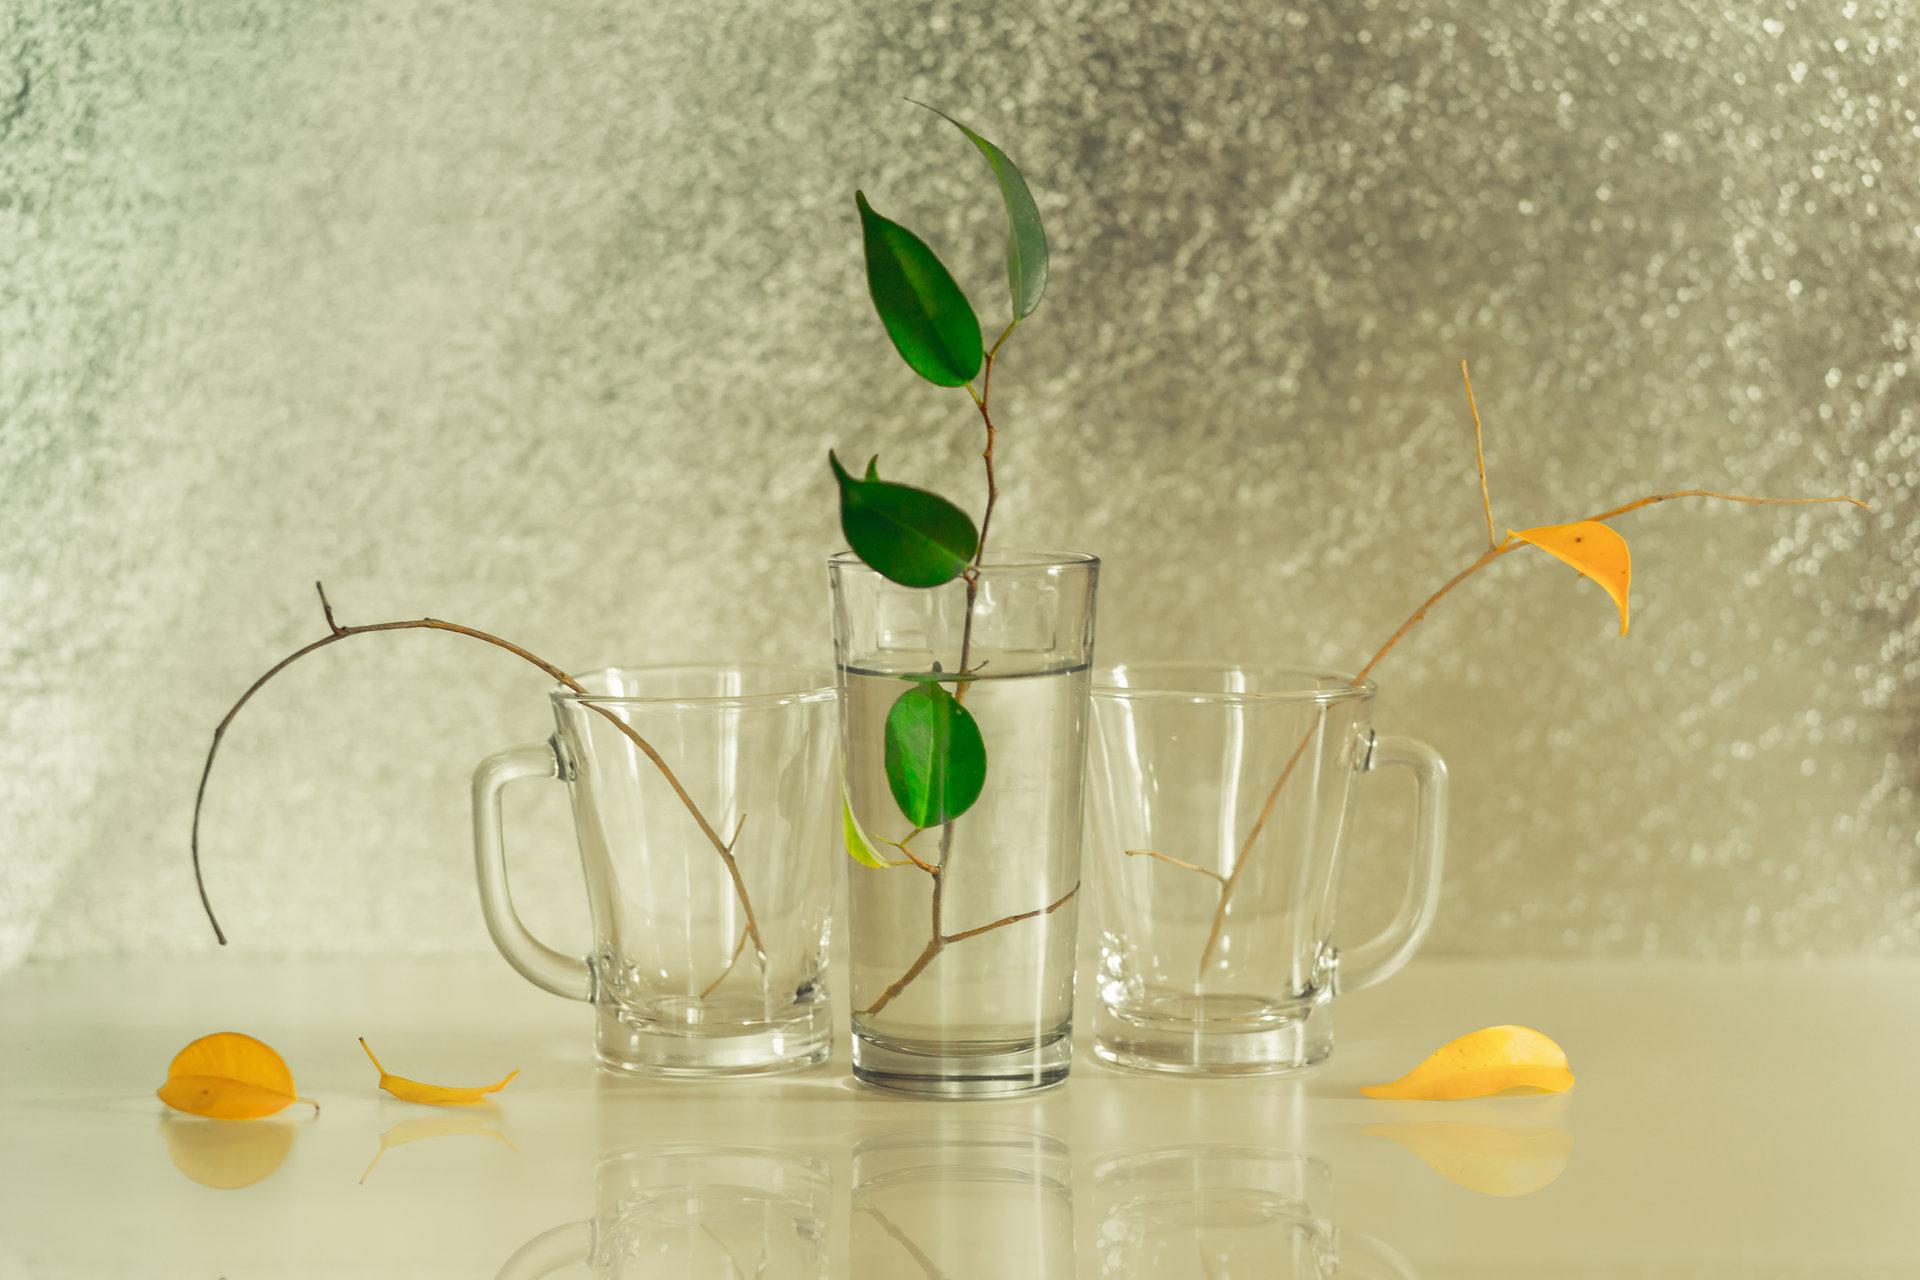 Чаша вода | Author Lyubomir  Nikolov - Lyubomir.Nikolov | PHOTO FORUM